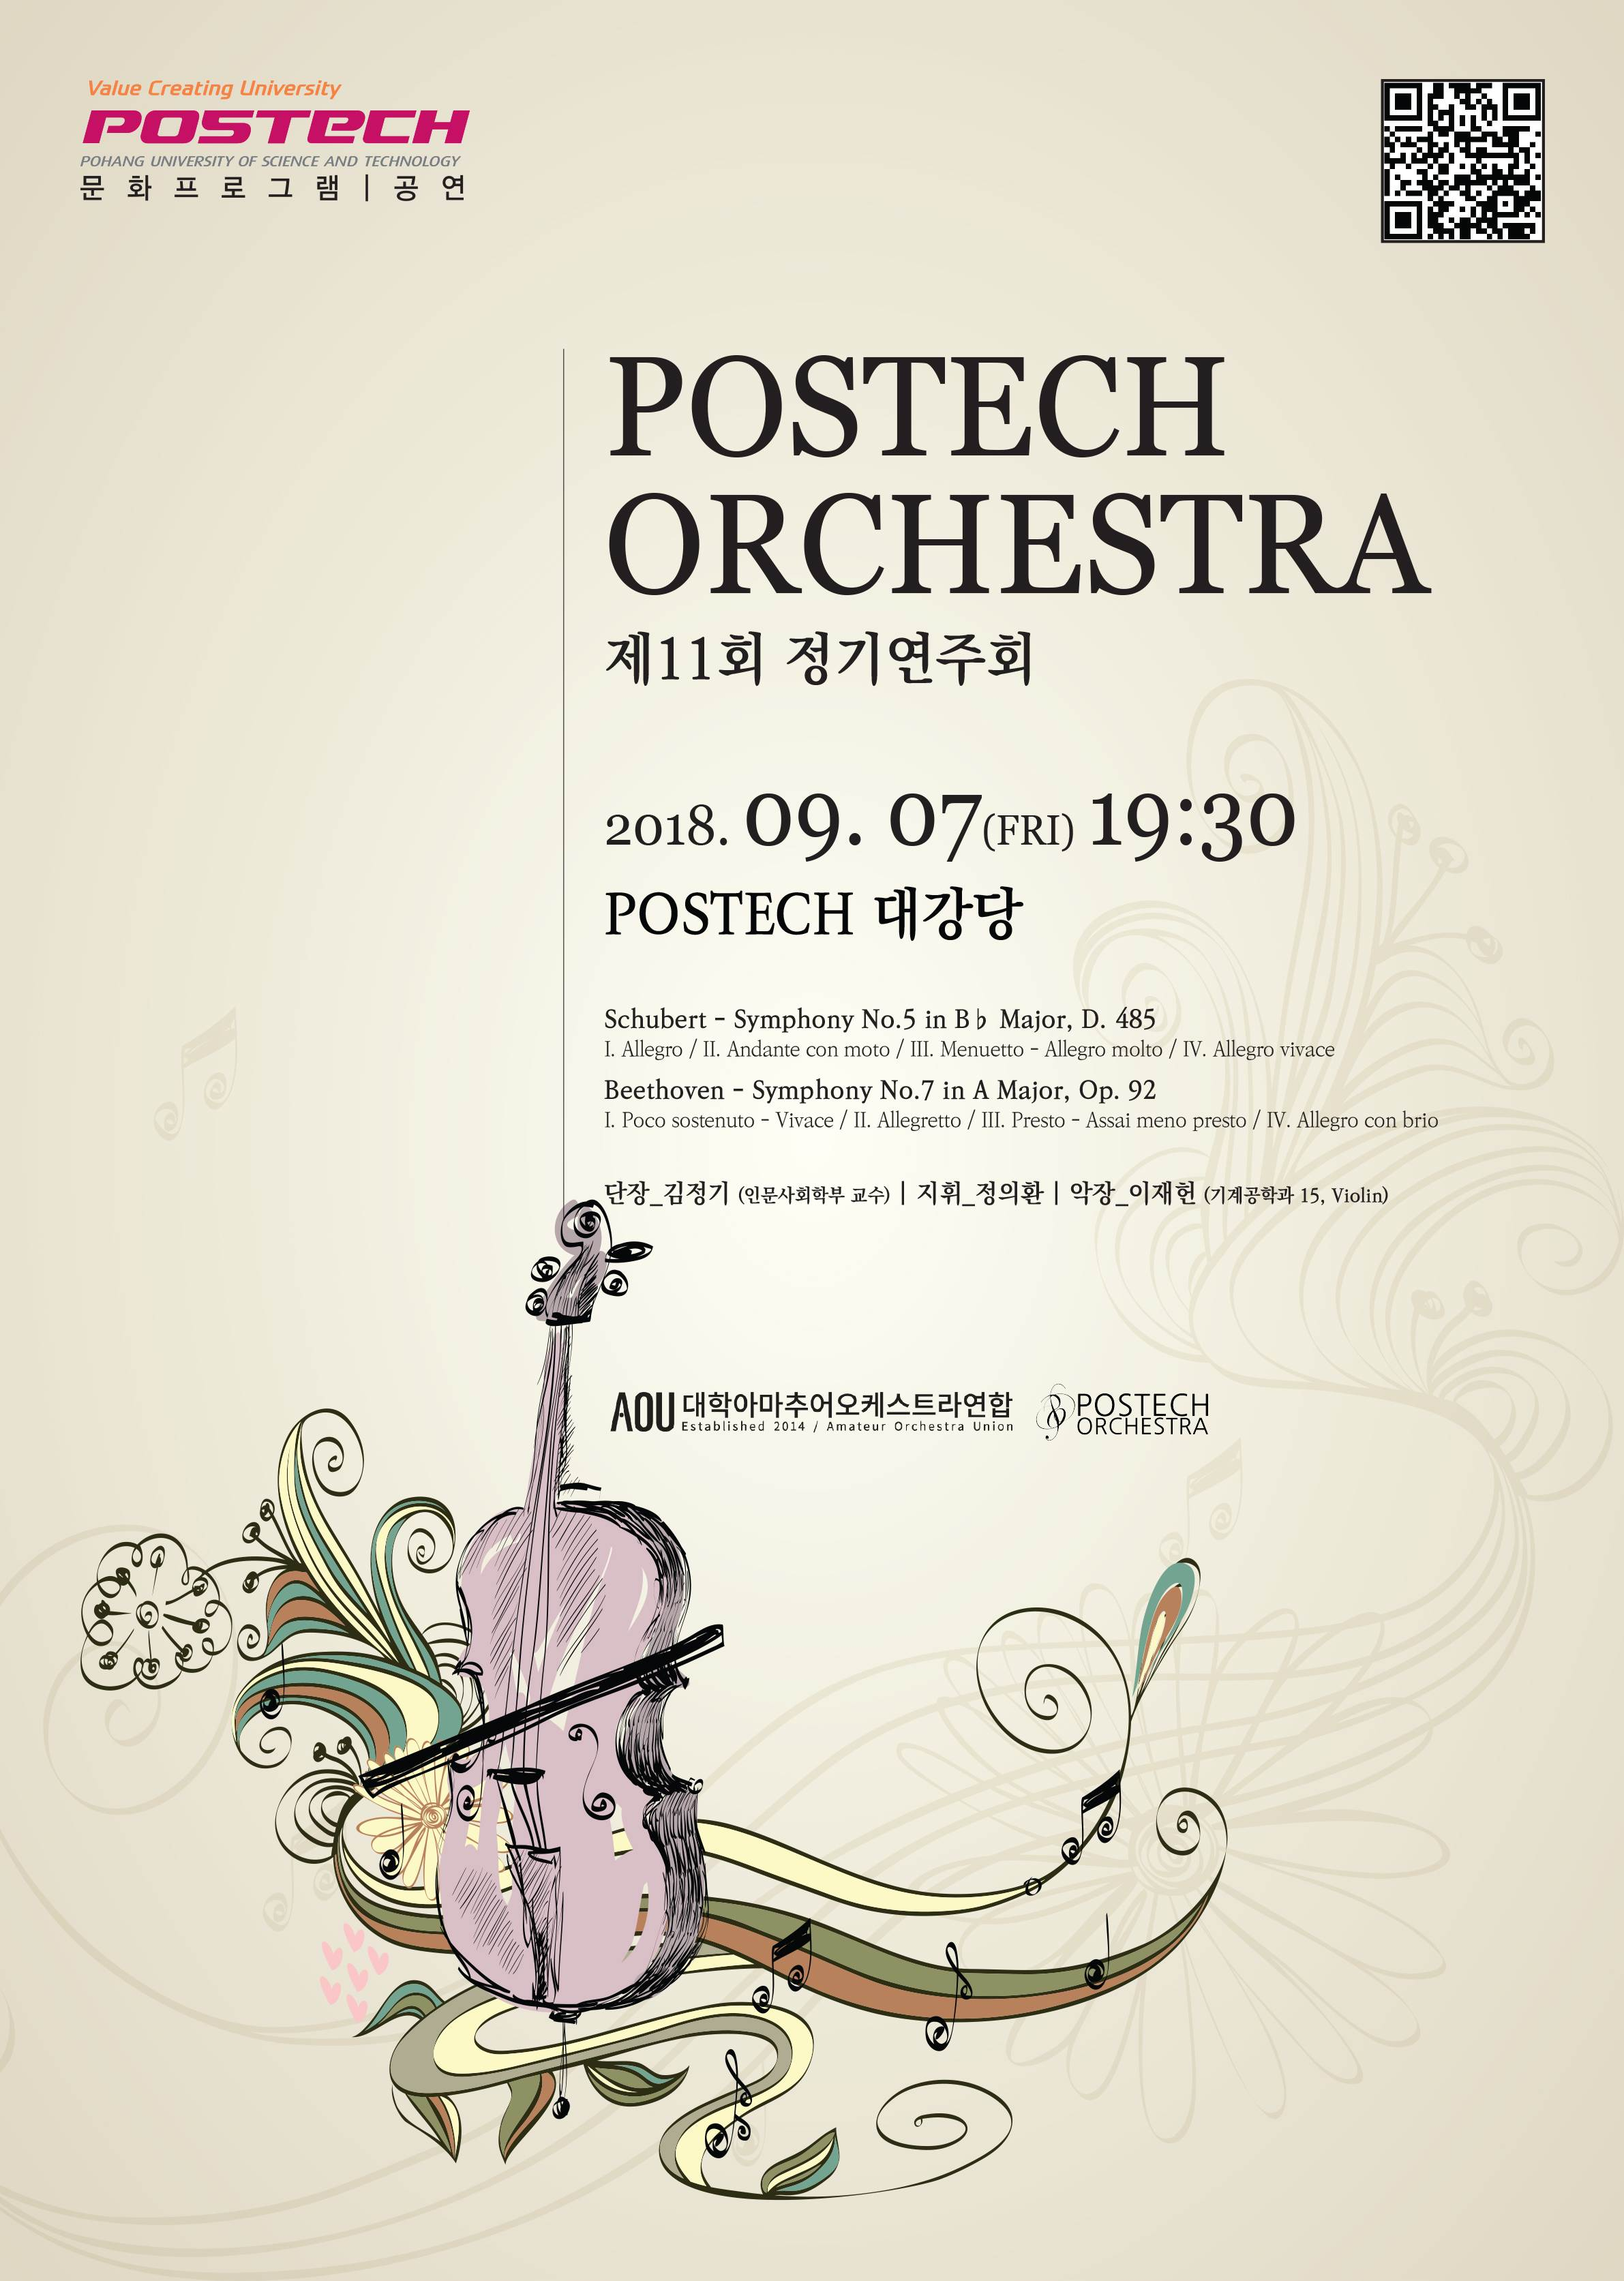 POSTECH ORCHESTRA 제 11회 정기연주회 2018.09.07(FRI) 19:30 POSTECH 대강당 Schubert - Symphony No.5 in Major, D.485 I. Allegro / II. Andante con mato/ III. Menuetto - Allegro molut/ IV. Allegro vivace  Beethoven - Symphony No.7 in A Major, Op.92 I. Poco sostenuto - Vivace / II. Allegretto/ III. Presto - Assai meno presto/ IV.Allegro con brio 단장_김정기(인문사회학부 교수) 지휘 정의환 악장 이재헌(기계공학과,  Violin) AOU대학아마추어오케스트라연합 POSECH ORCHESTRA